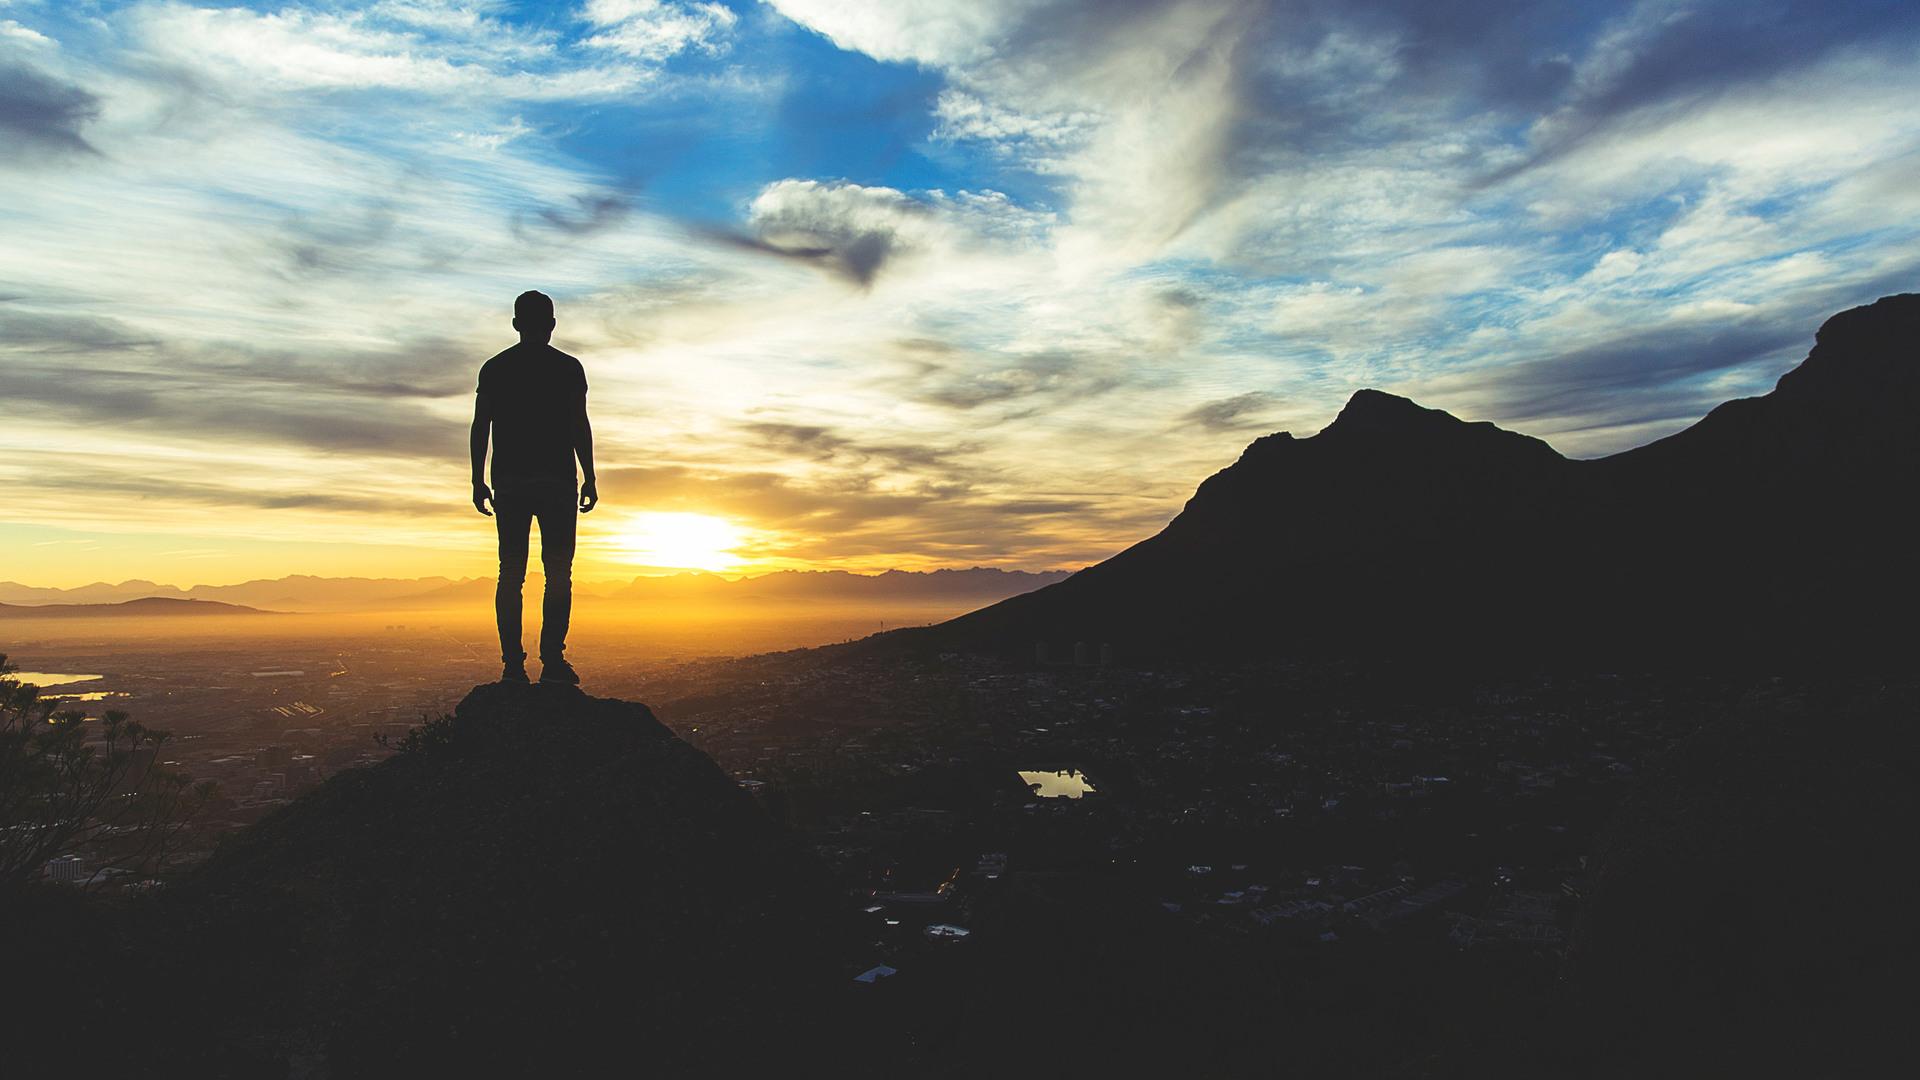 Alone Man At Sunset Sky Hill Do